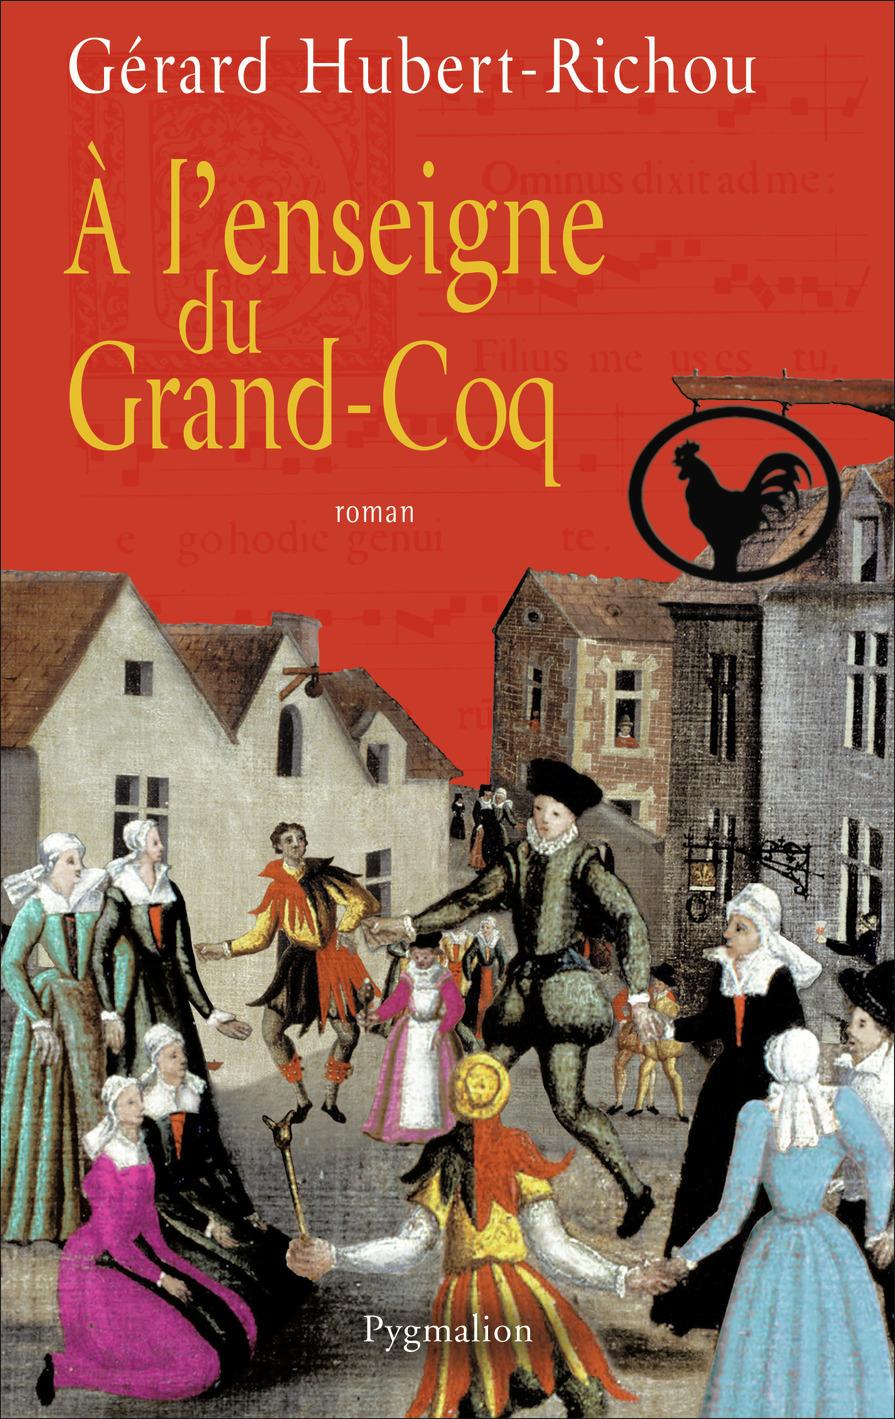 A L'ENSEIGNE DU GRAND-COQ